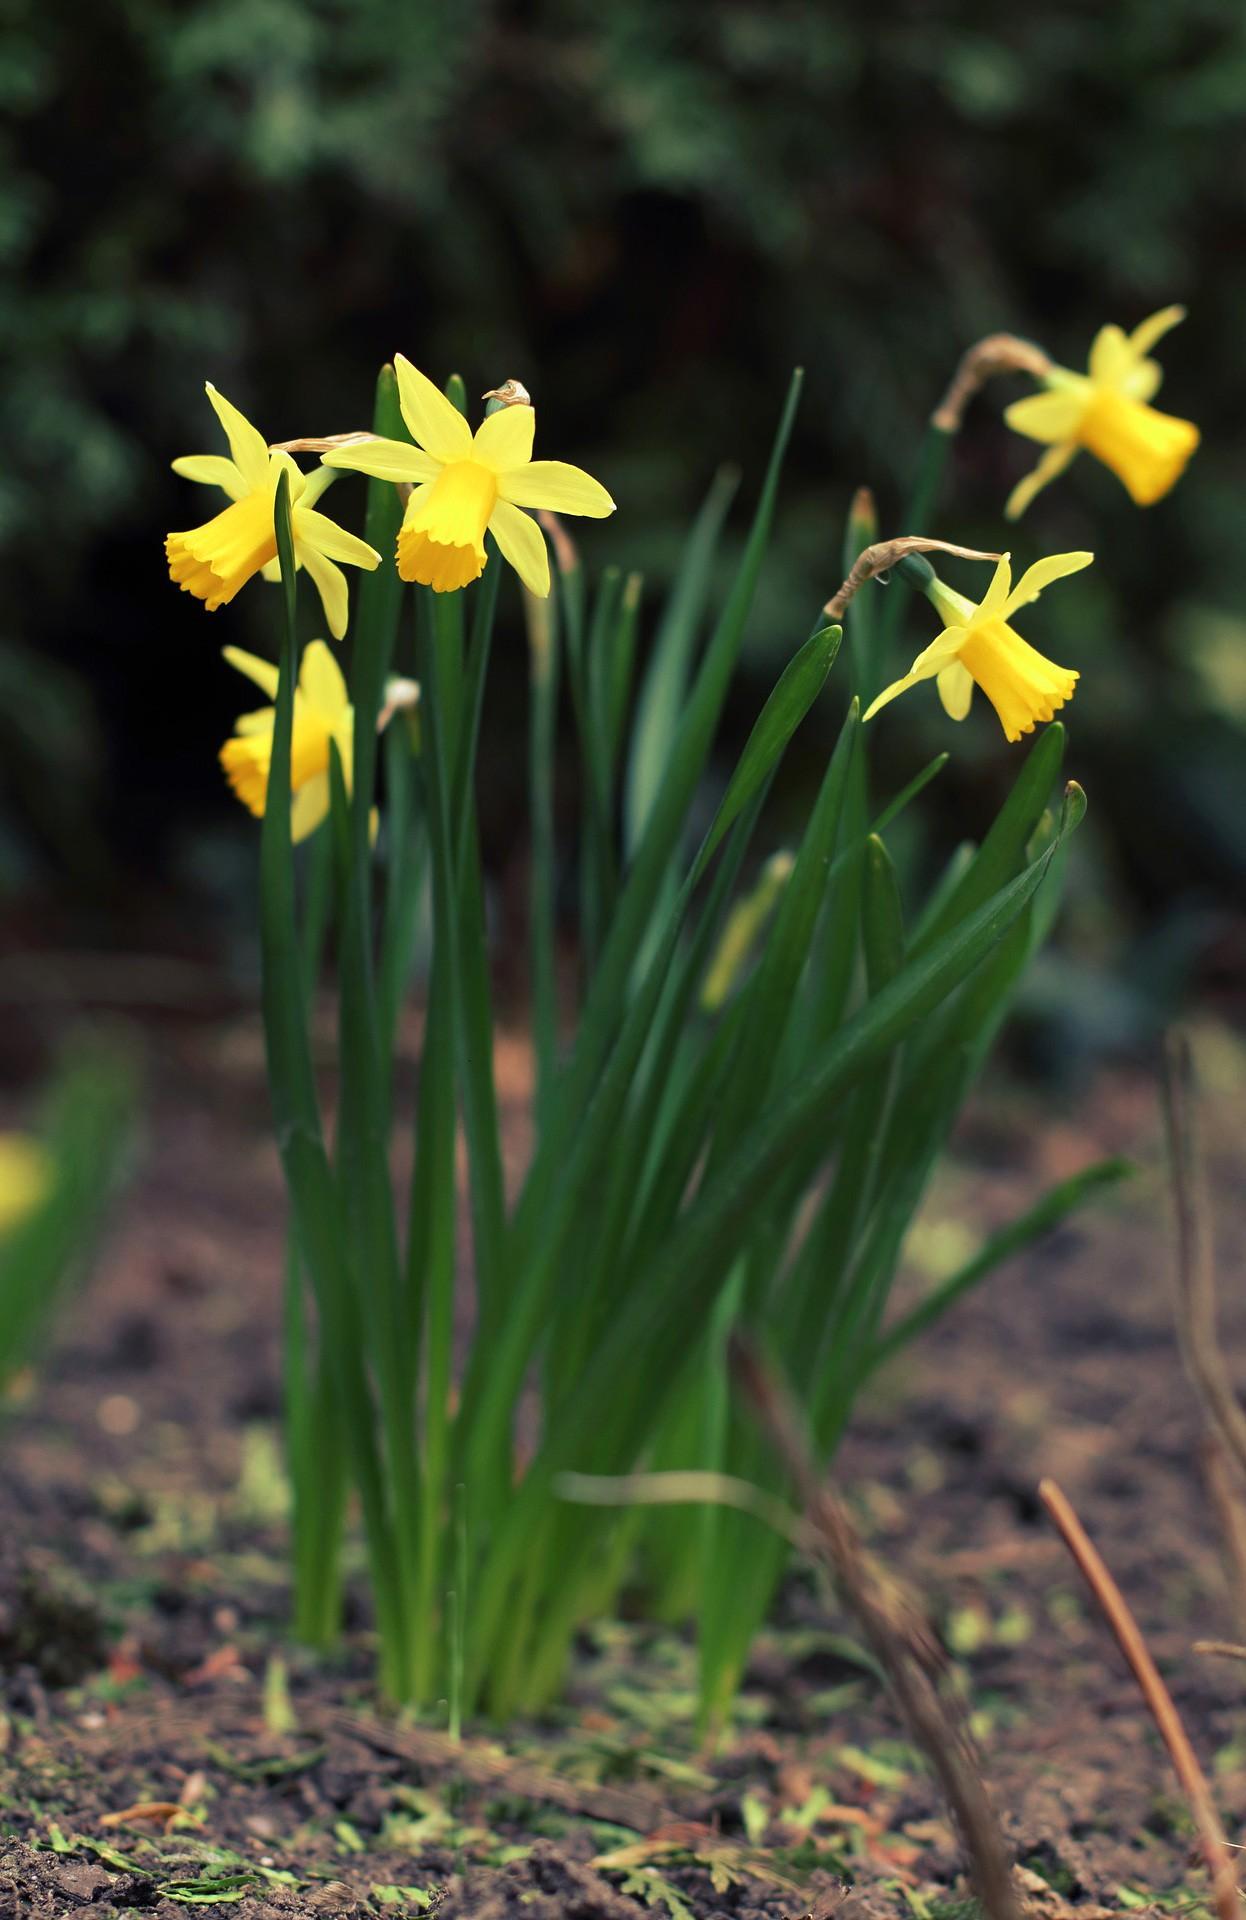 daffodil - photo #43